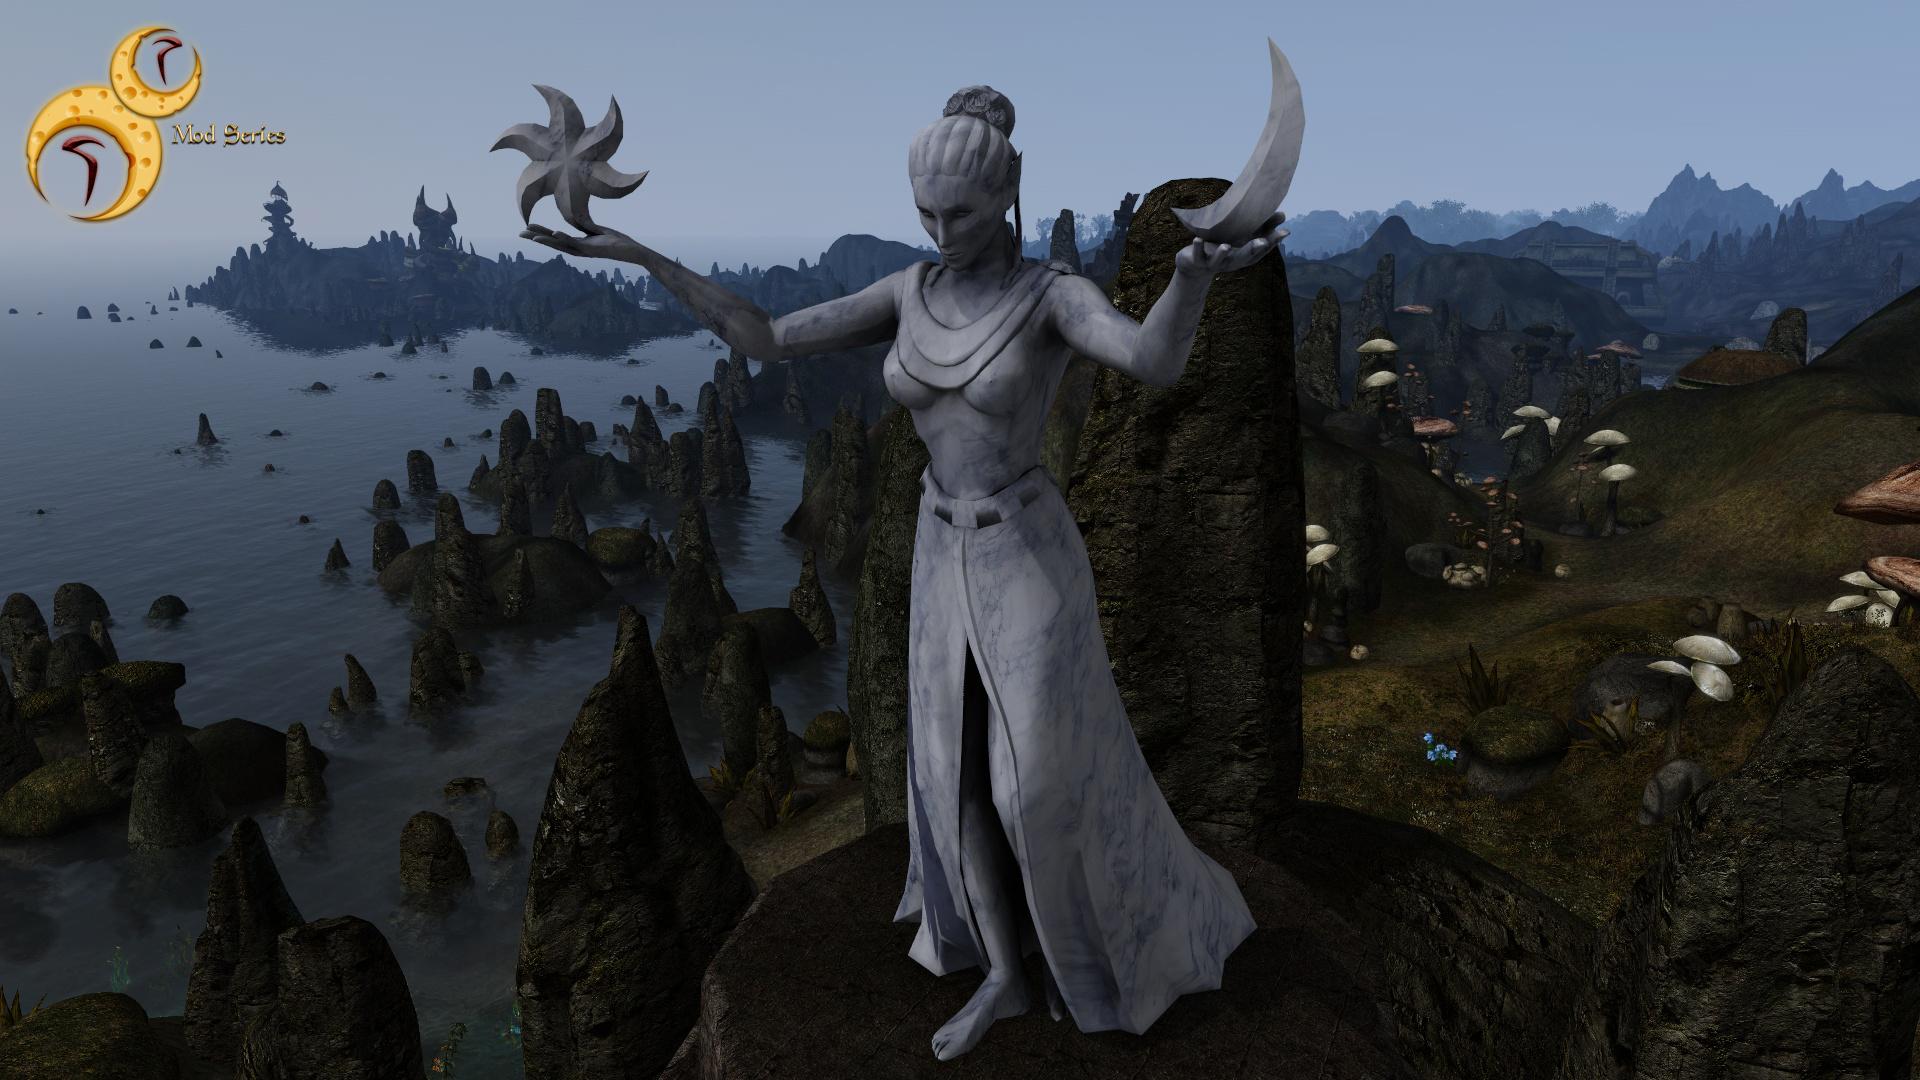 rr mod series azura statue replacer the elder scrolls mods wiki fandom powered by wikia Oblivion Game Meme Oblivion Game Map